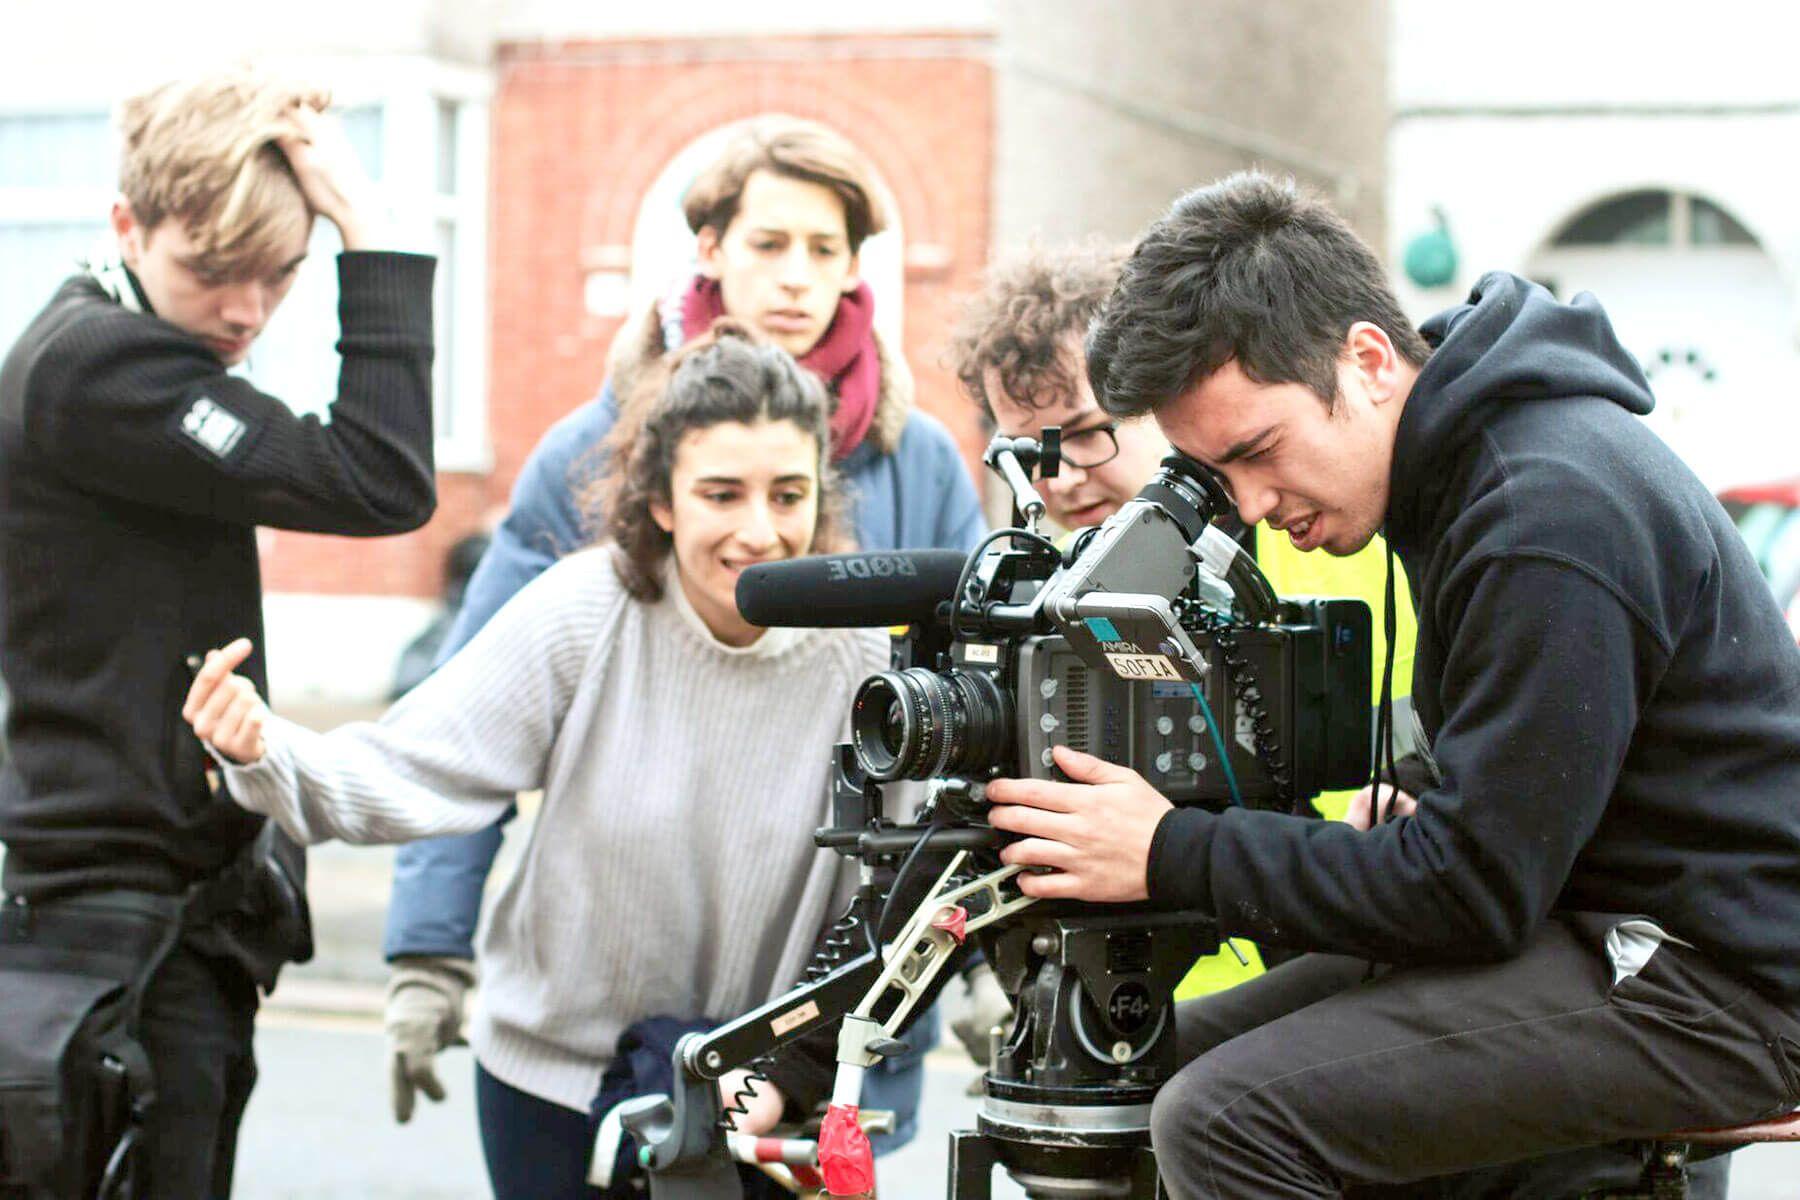 Film students on set of Nail - Photo by Rachel Kiki